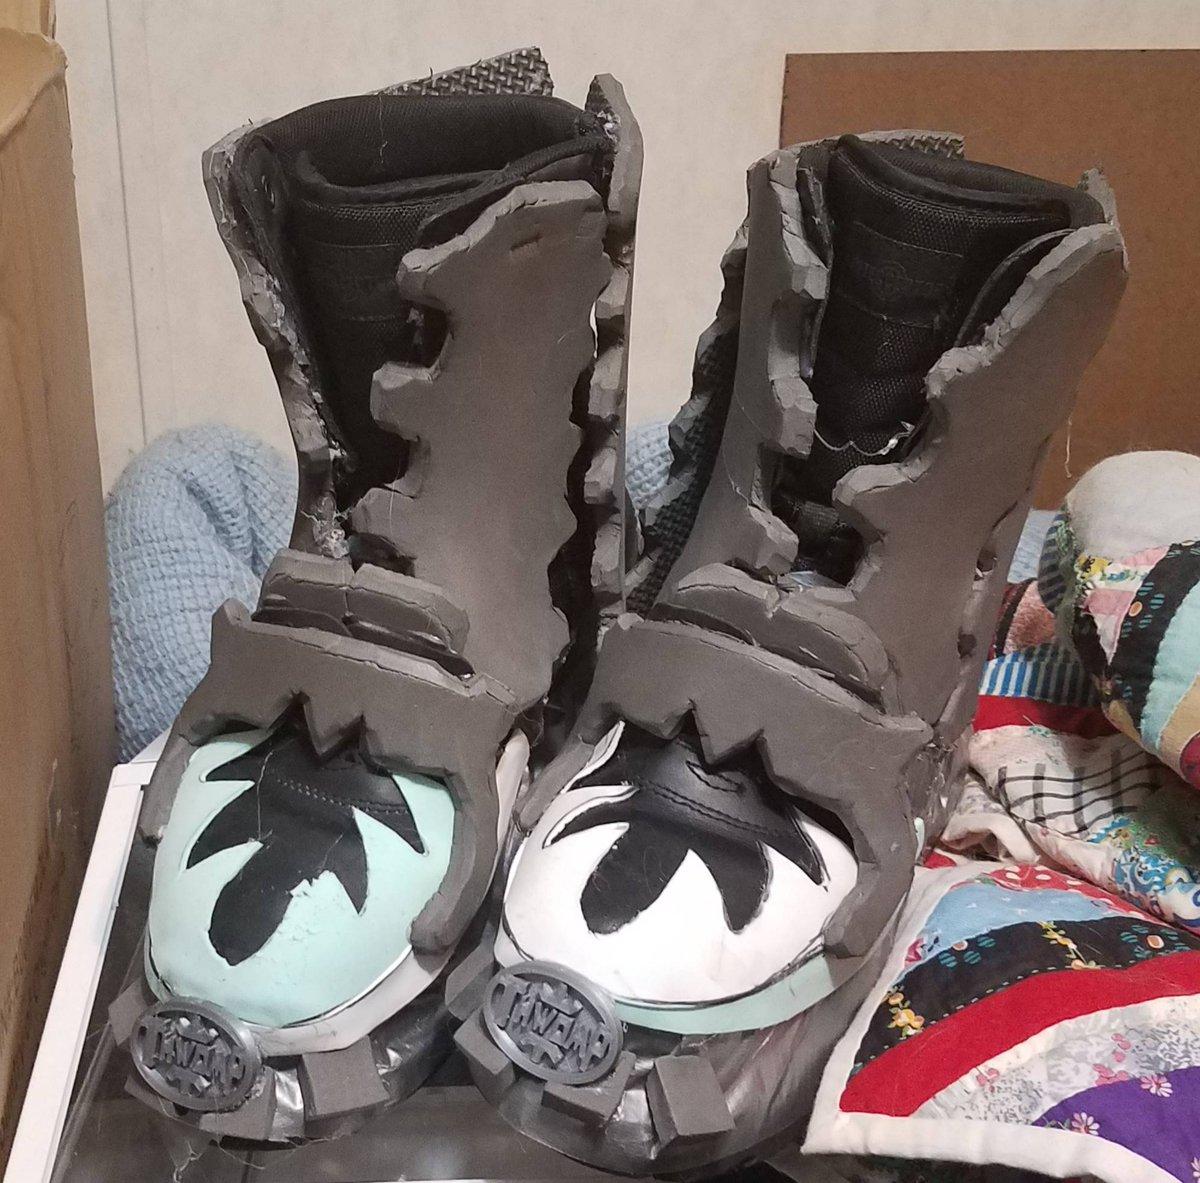 Time to get stomping! #mario #luigi #mariobros #SMB #80s #80smovies #classic #mariobrosmovie #movie #underrated #cosplay #cosplayer #boots #thwomp #stomper #foam #shoes #foamcraft #maker #design #illustrator #blender #retro #Nintendo #smbmoviepic.twitter.com/UNZjXqmBci